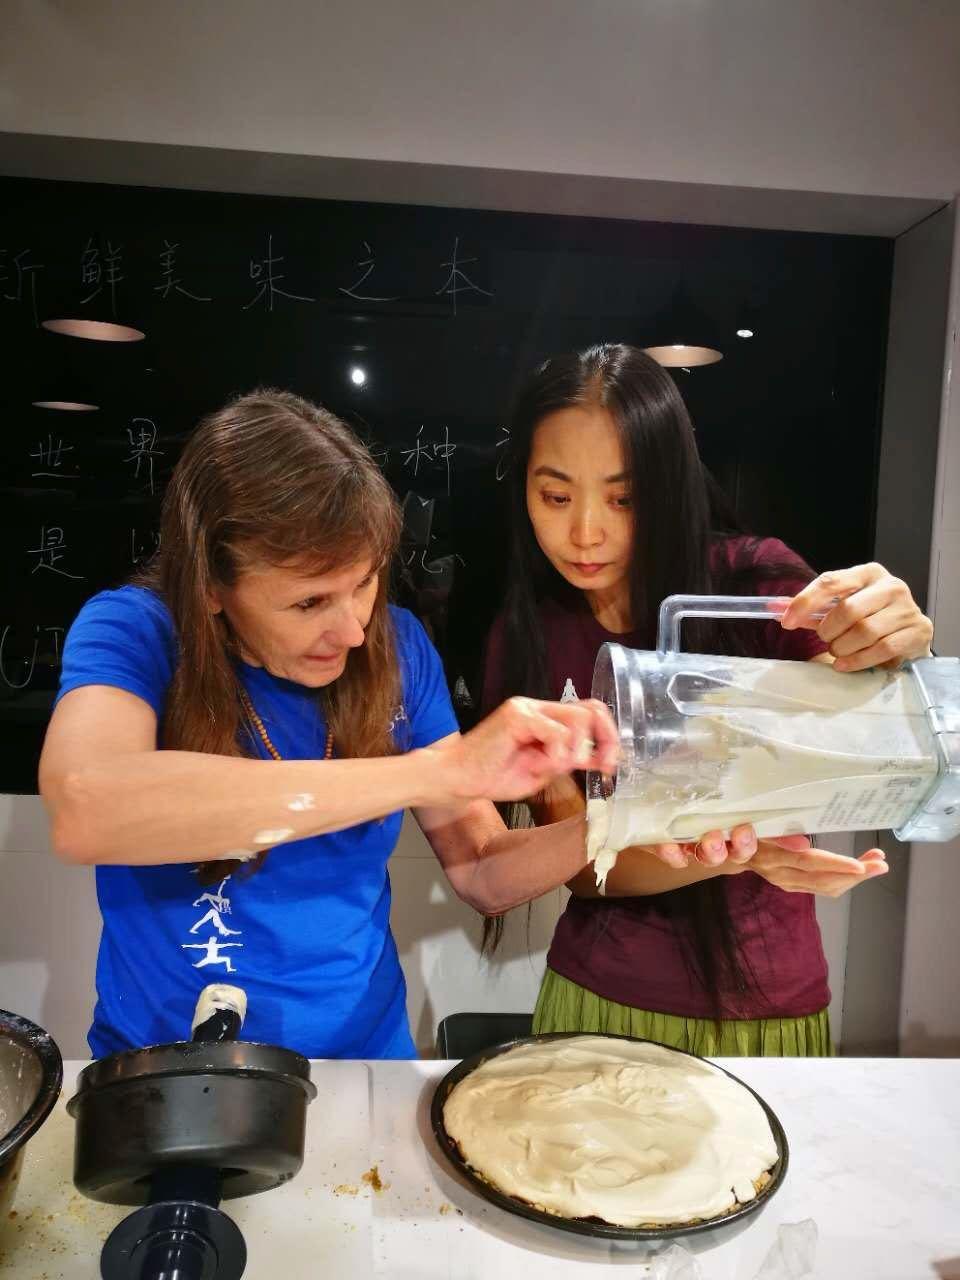 Beijing_Basisc_2017_Gina_Cindy_Cooking